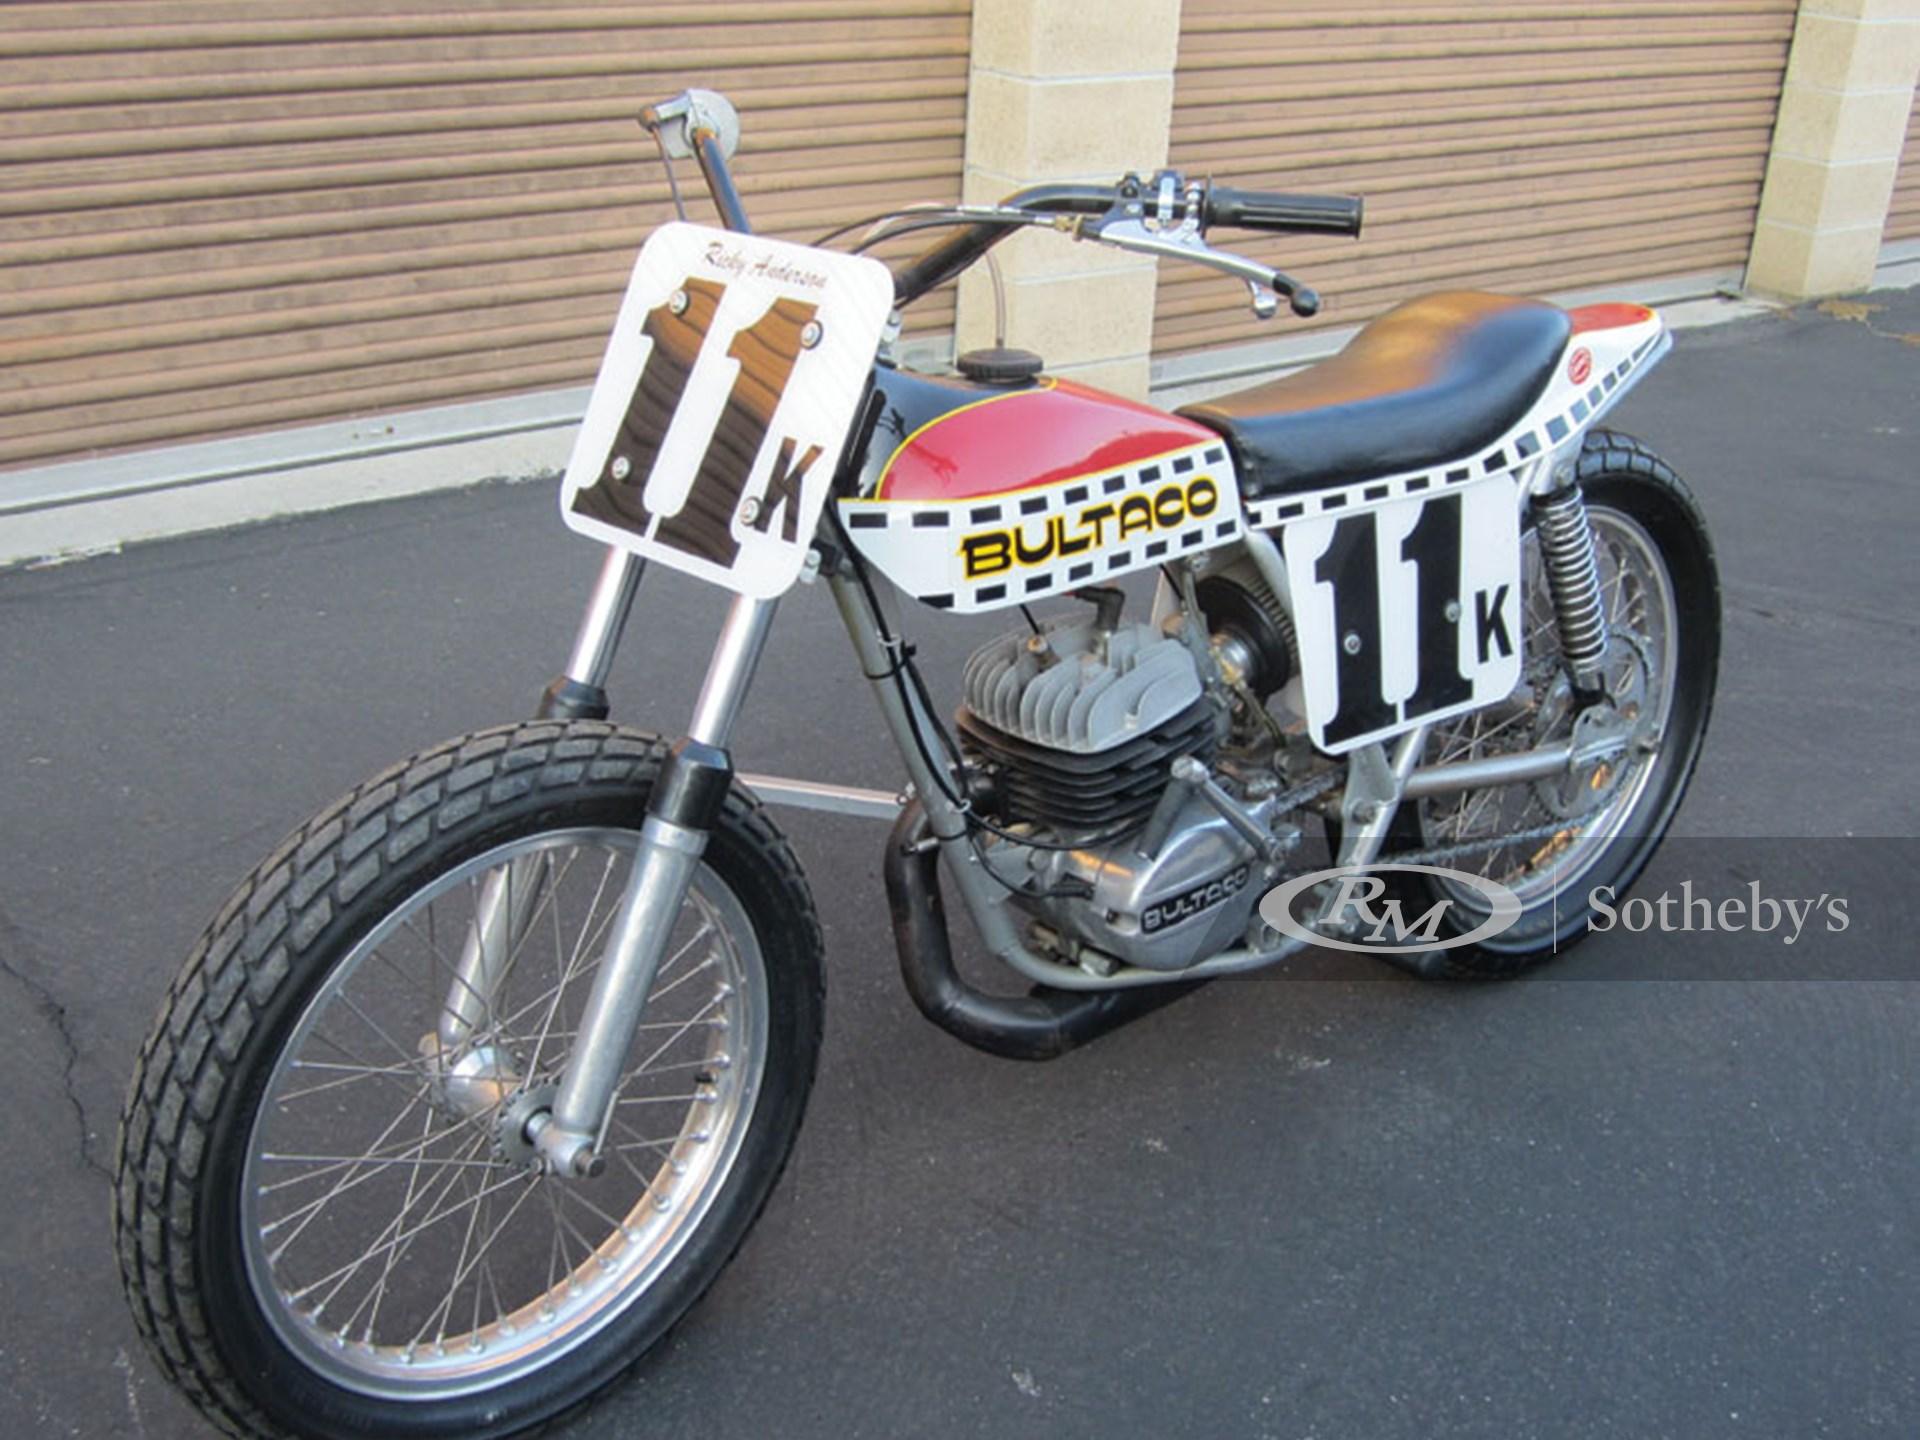 1966 Bultaco Astro